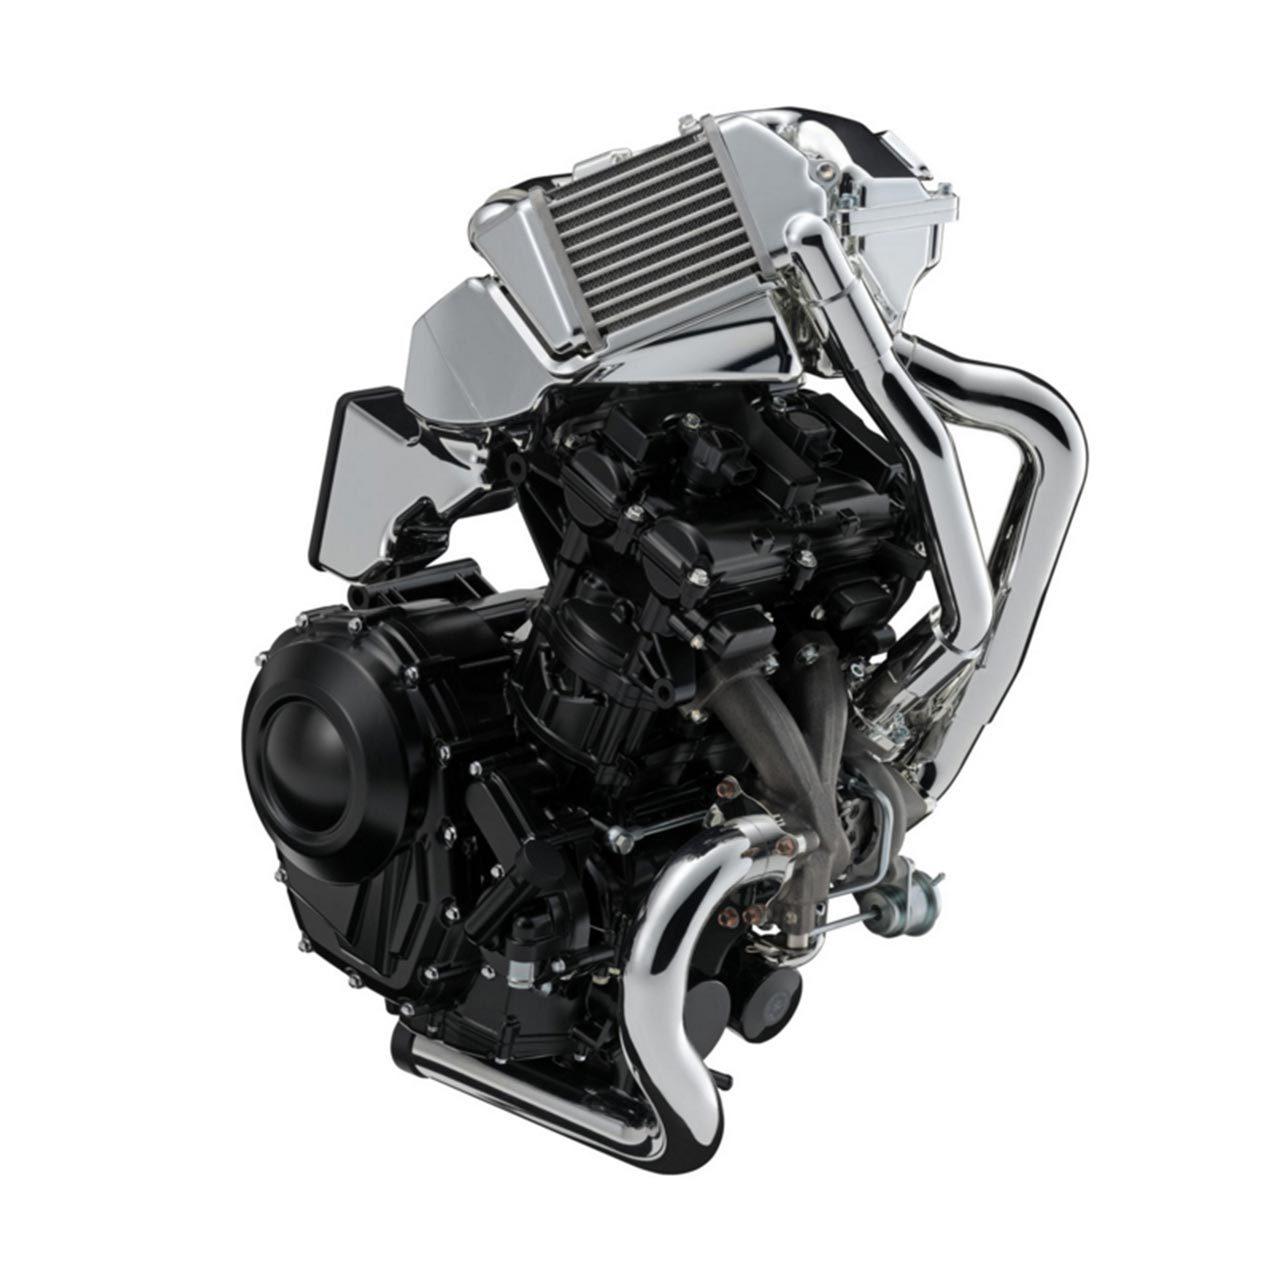 Turbo My Harley: Suzuki Shows Off Turbocharged Engine